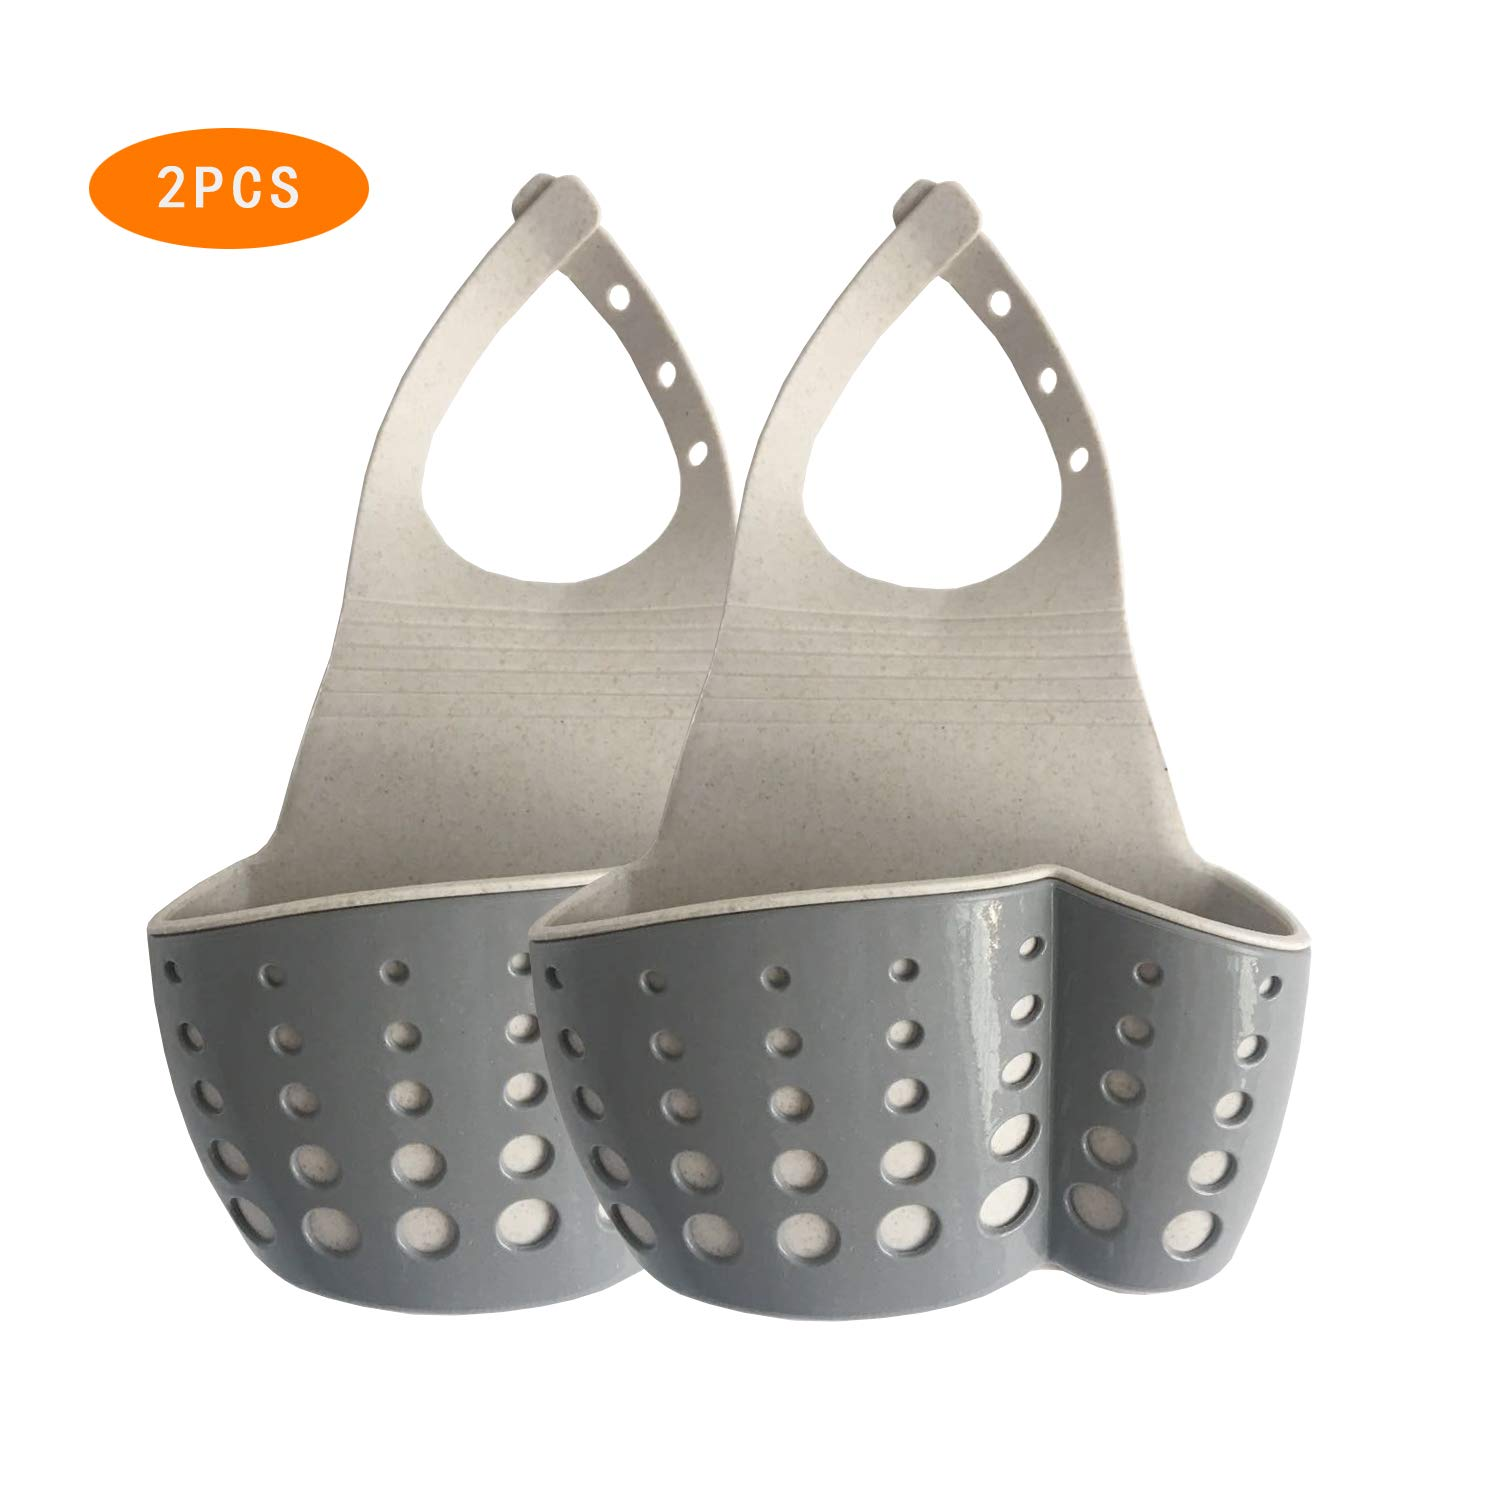 Set of 2,Grey,TuuTyss Wheat Straw Hanging Ajustable Strap Sink Caddy,Kitchen Bathroom Sponge Soap Holder